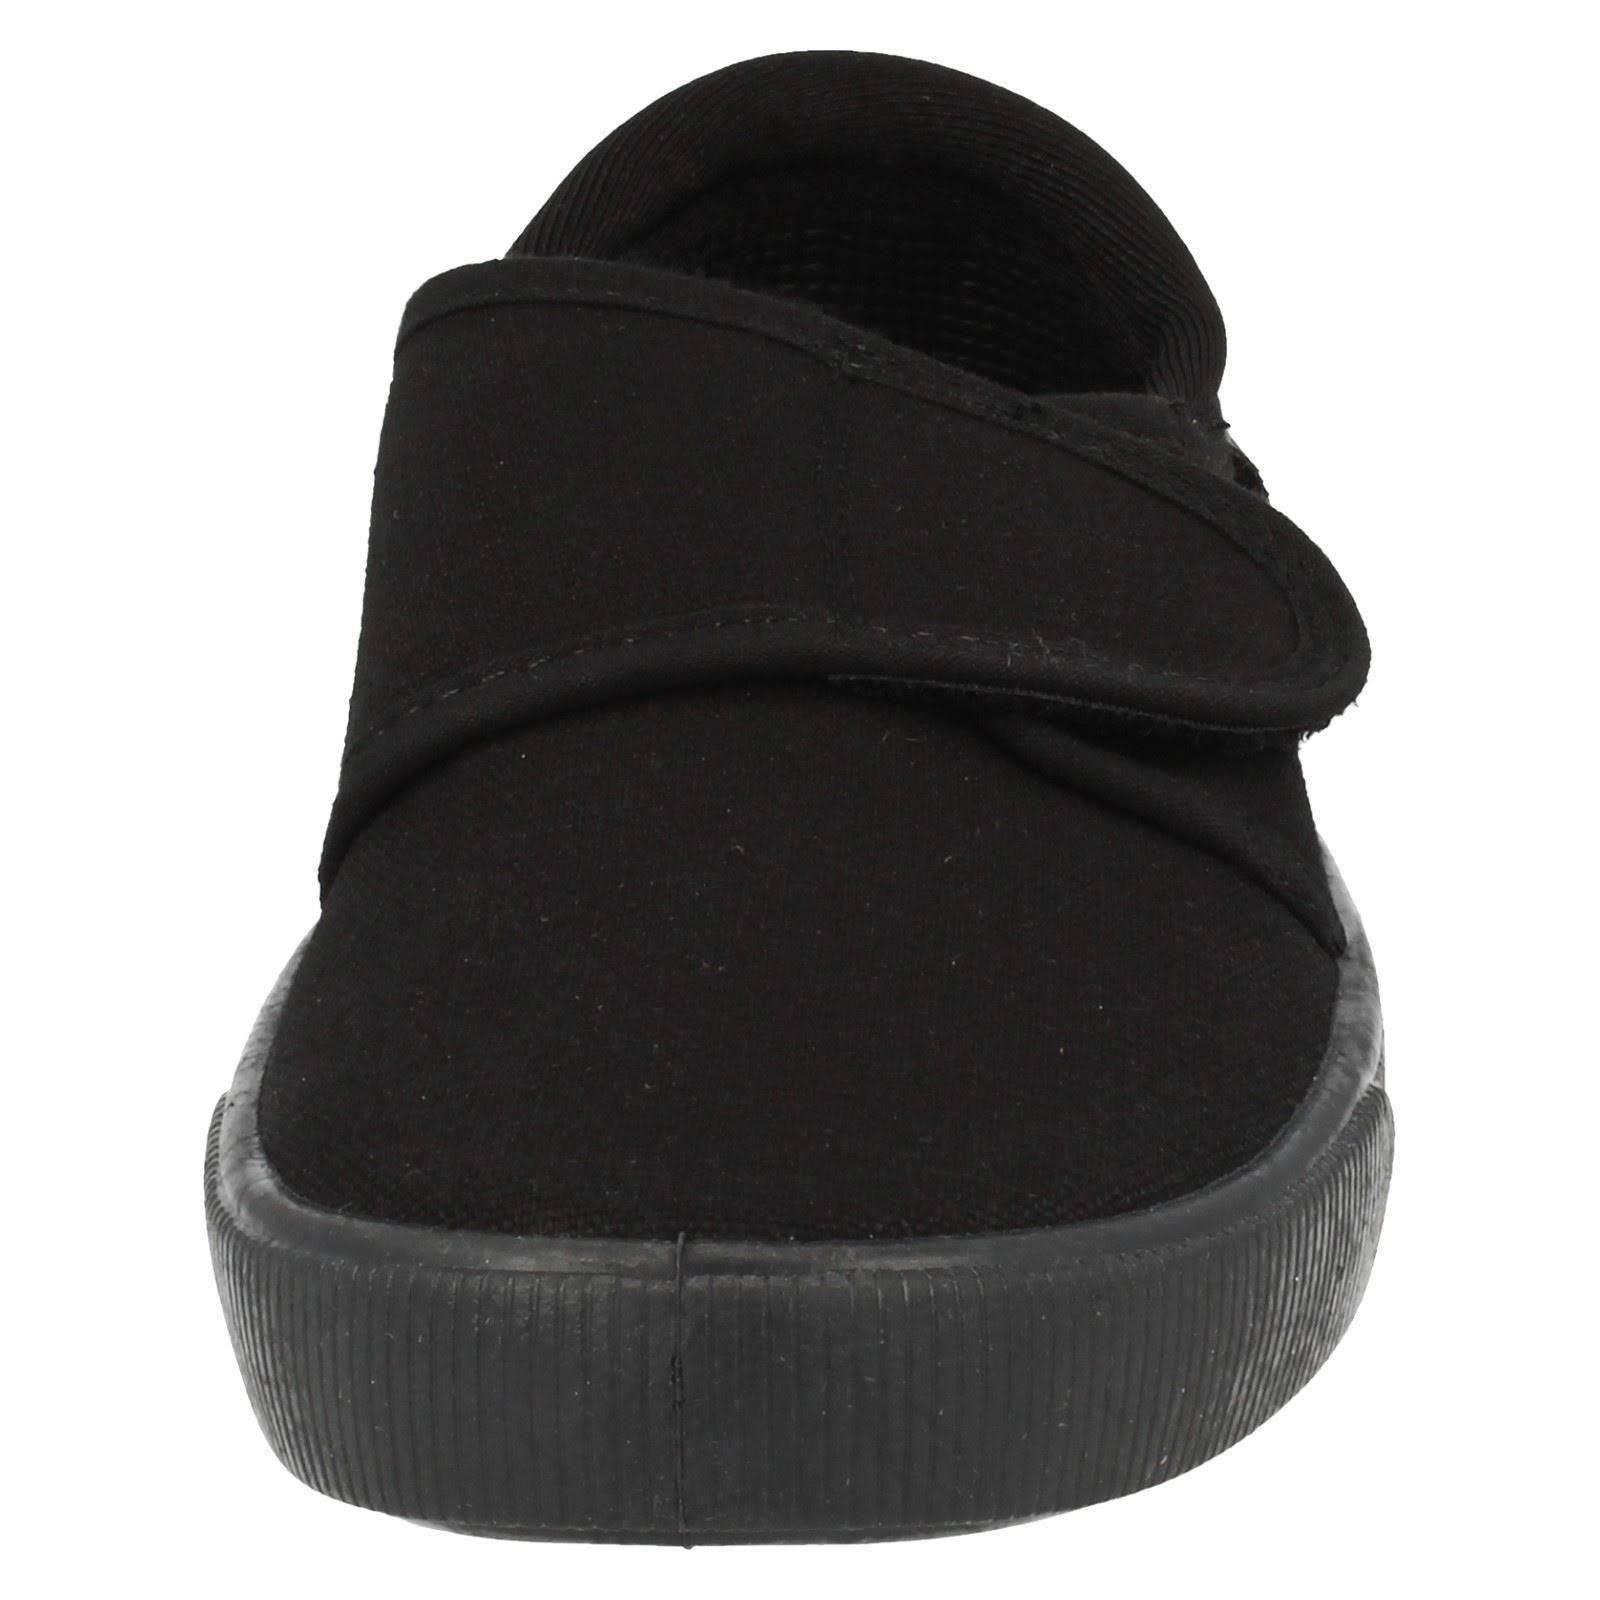 Clarks Hopper Run Plimsolls in Black Textile.  0LBuyY